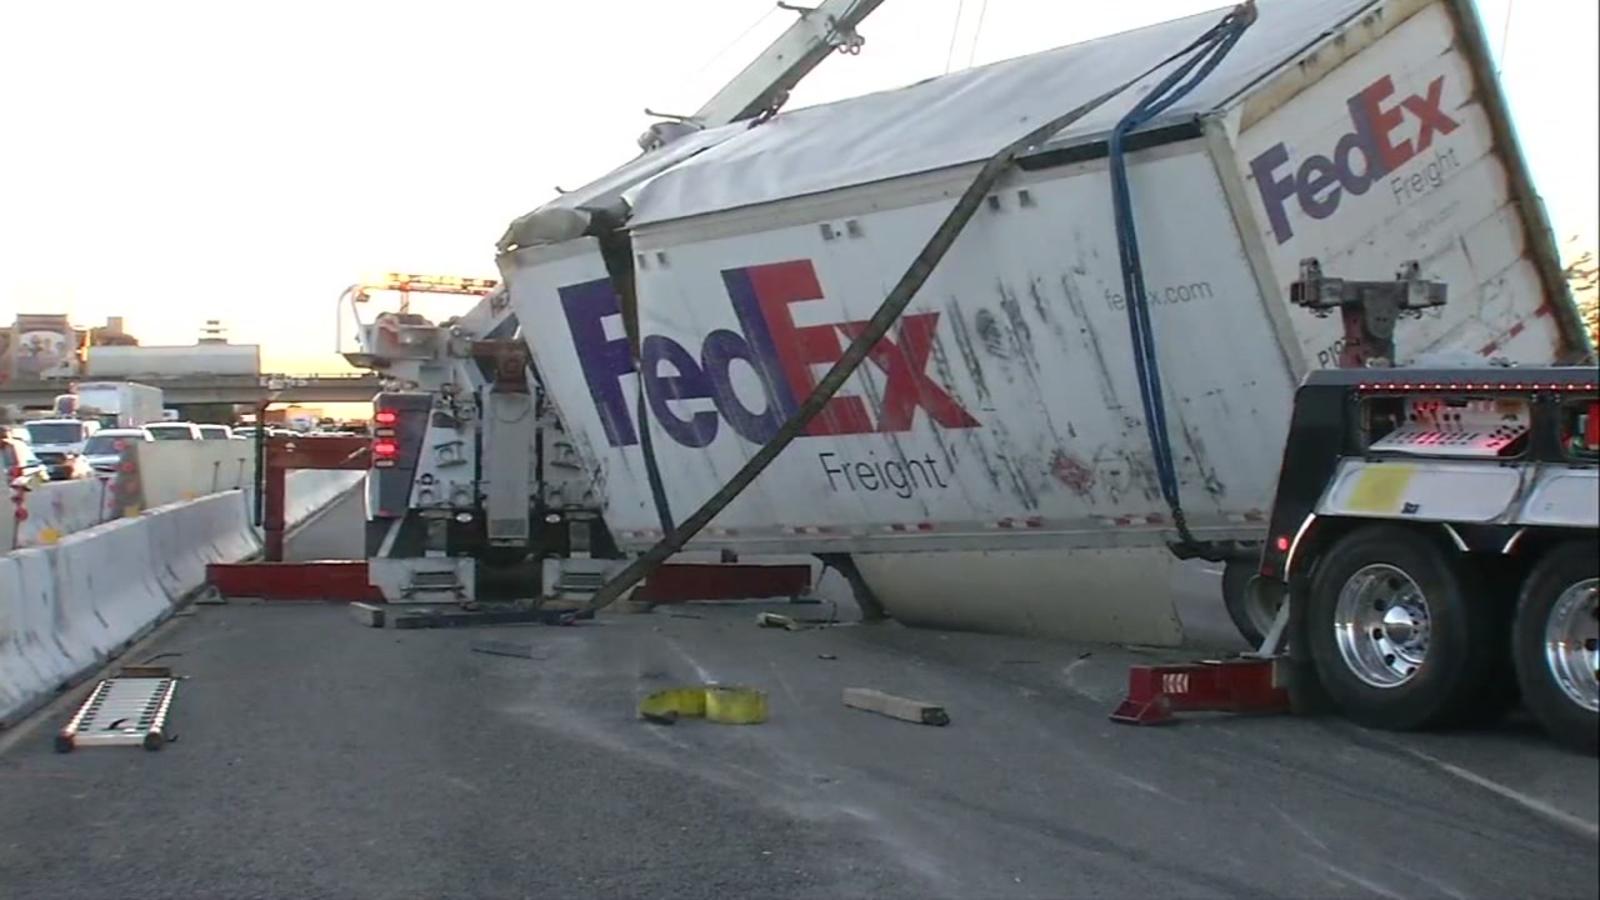 Man dies in crash between vehicle, FedEx truck on I-880